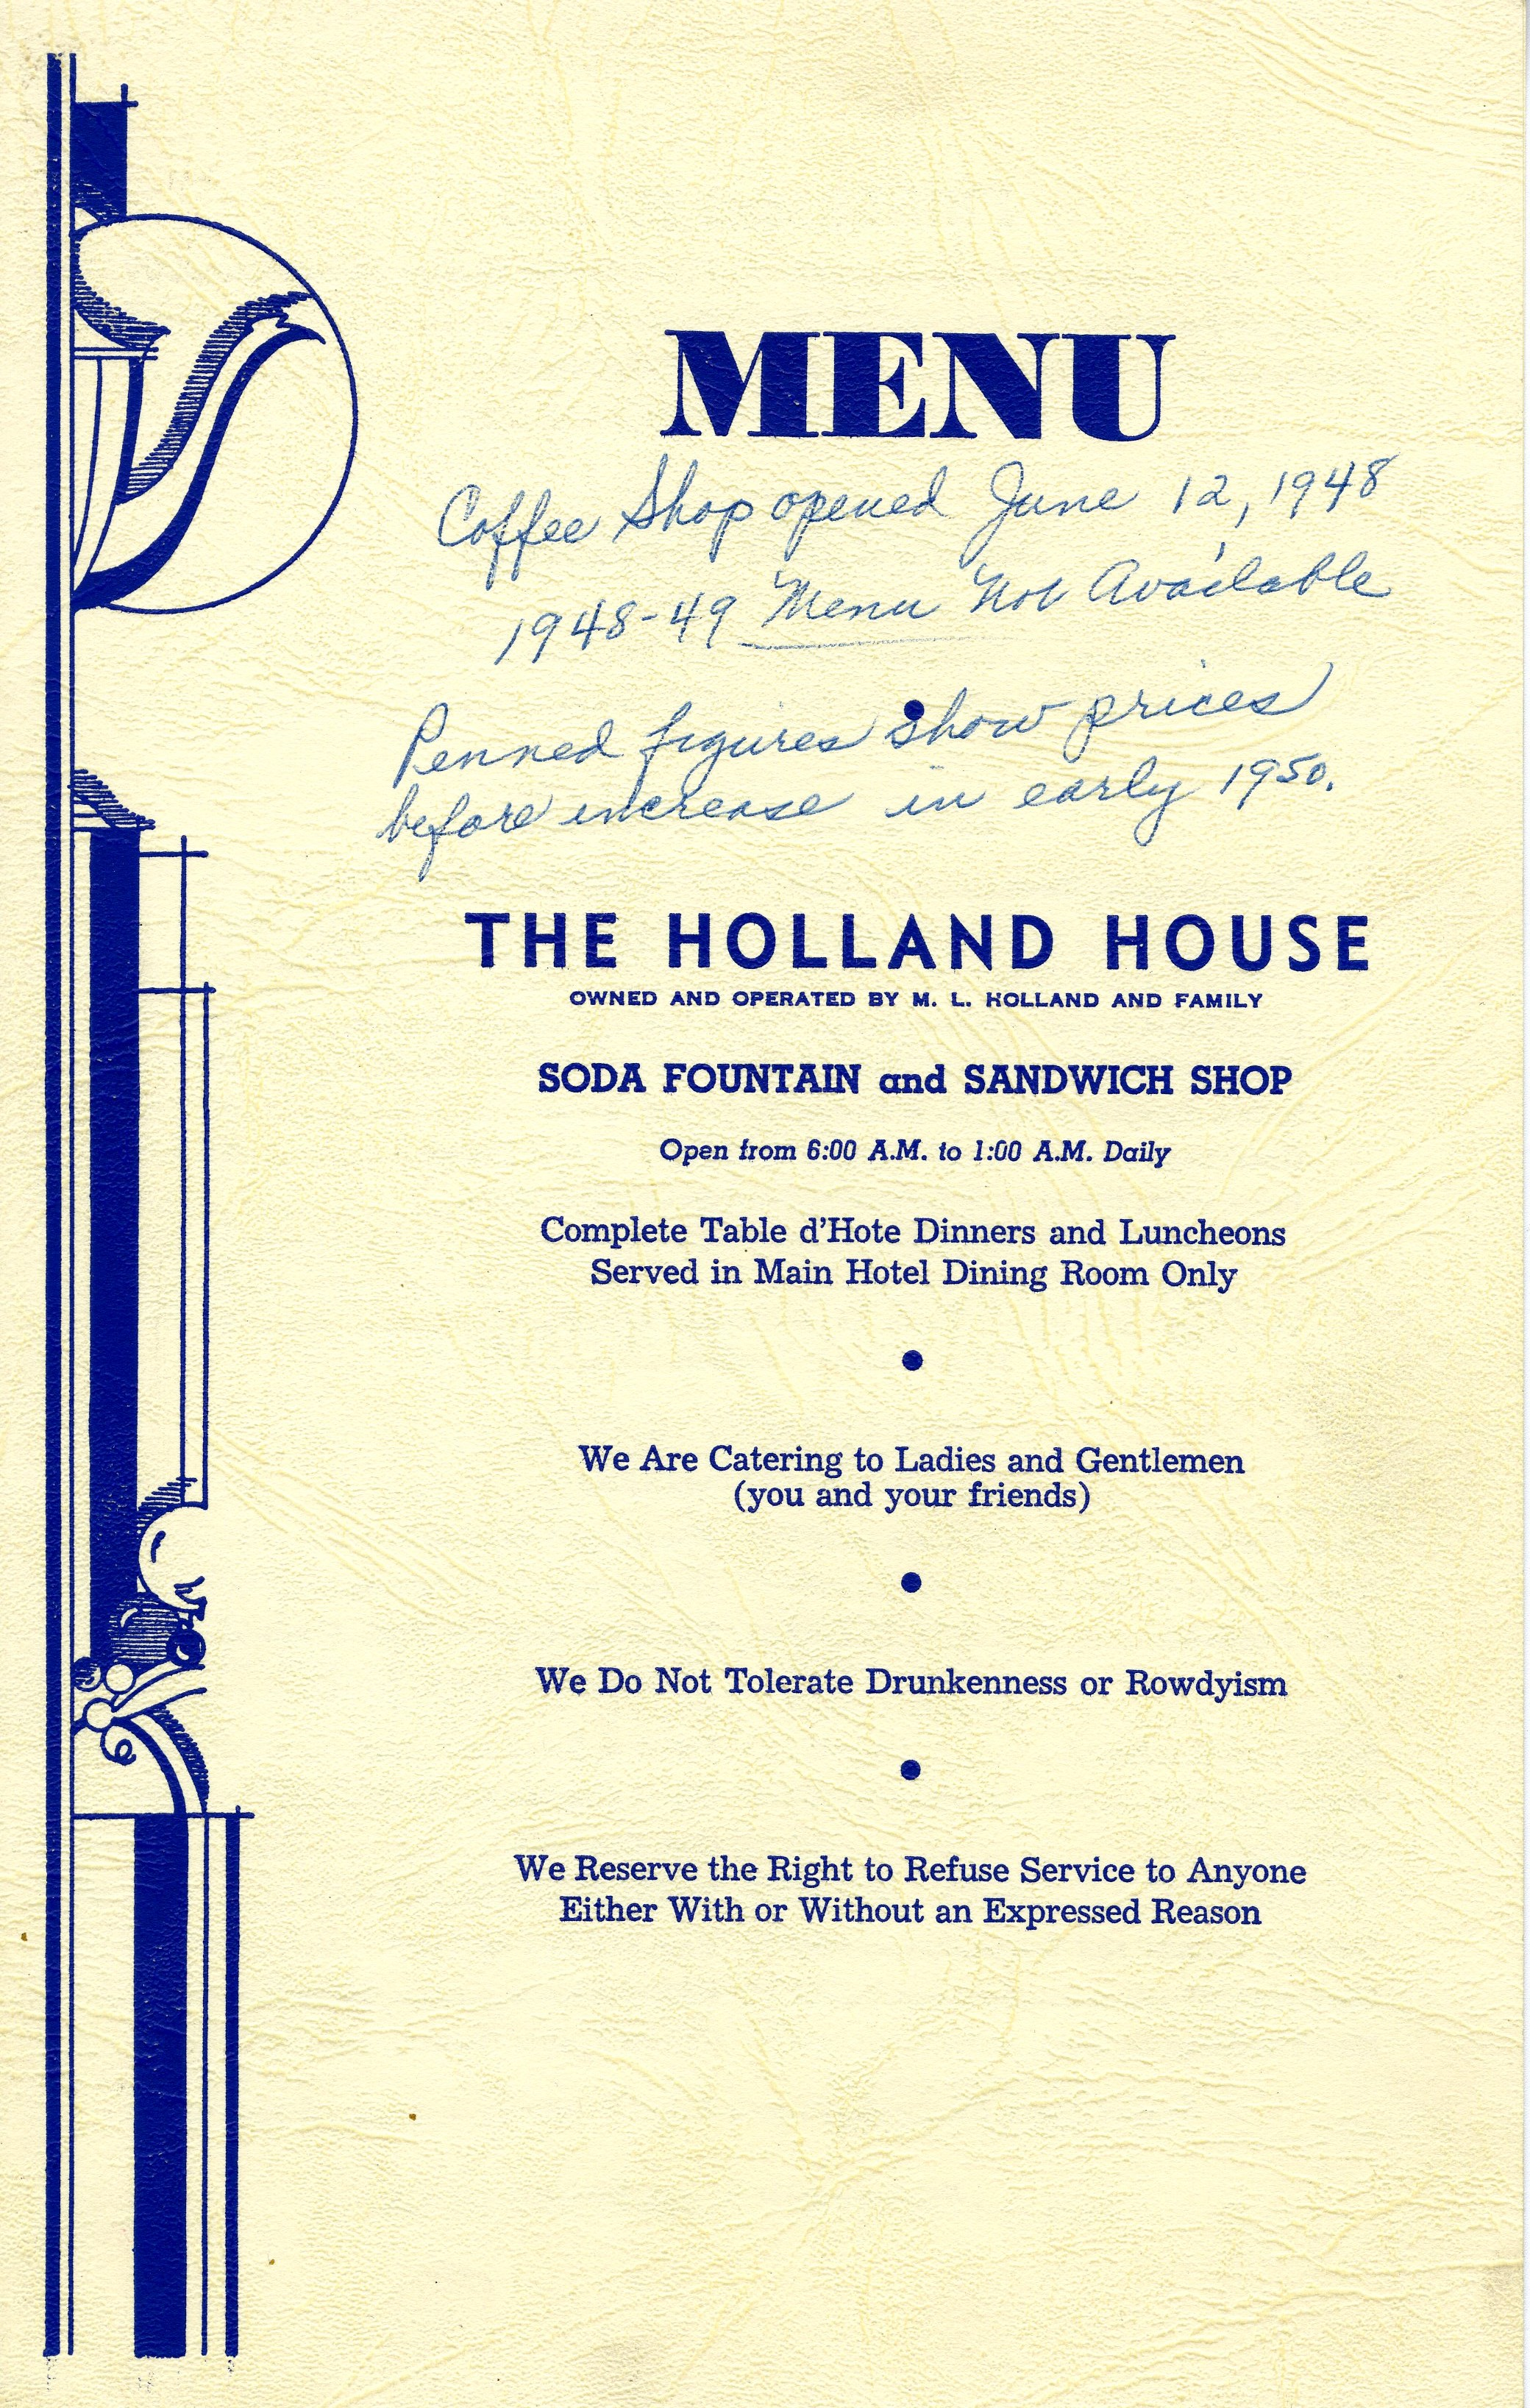 Table Mountain Inn Donates Holland House Menus Golden